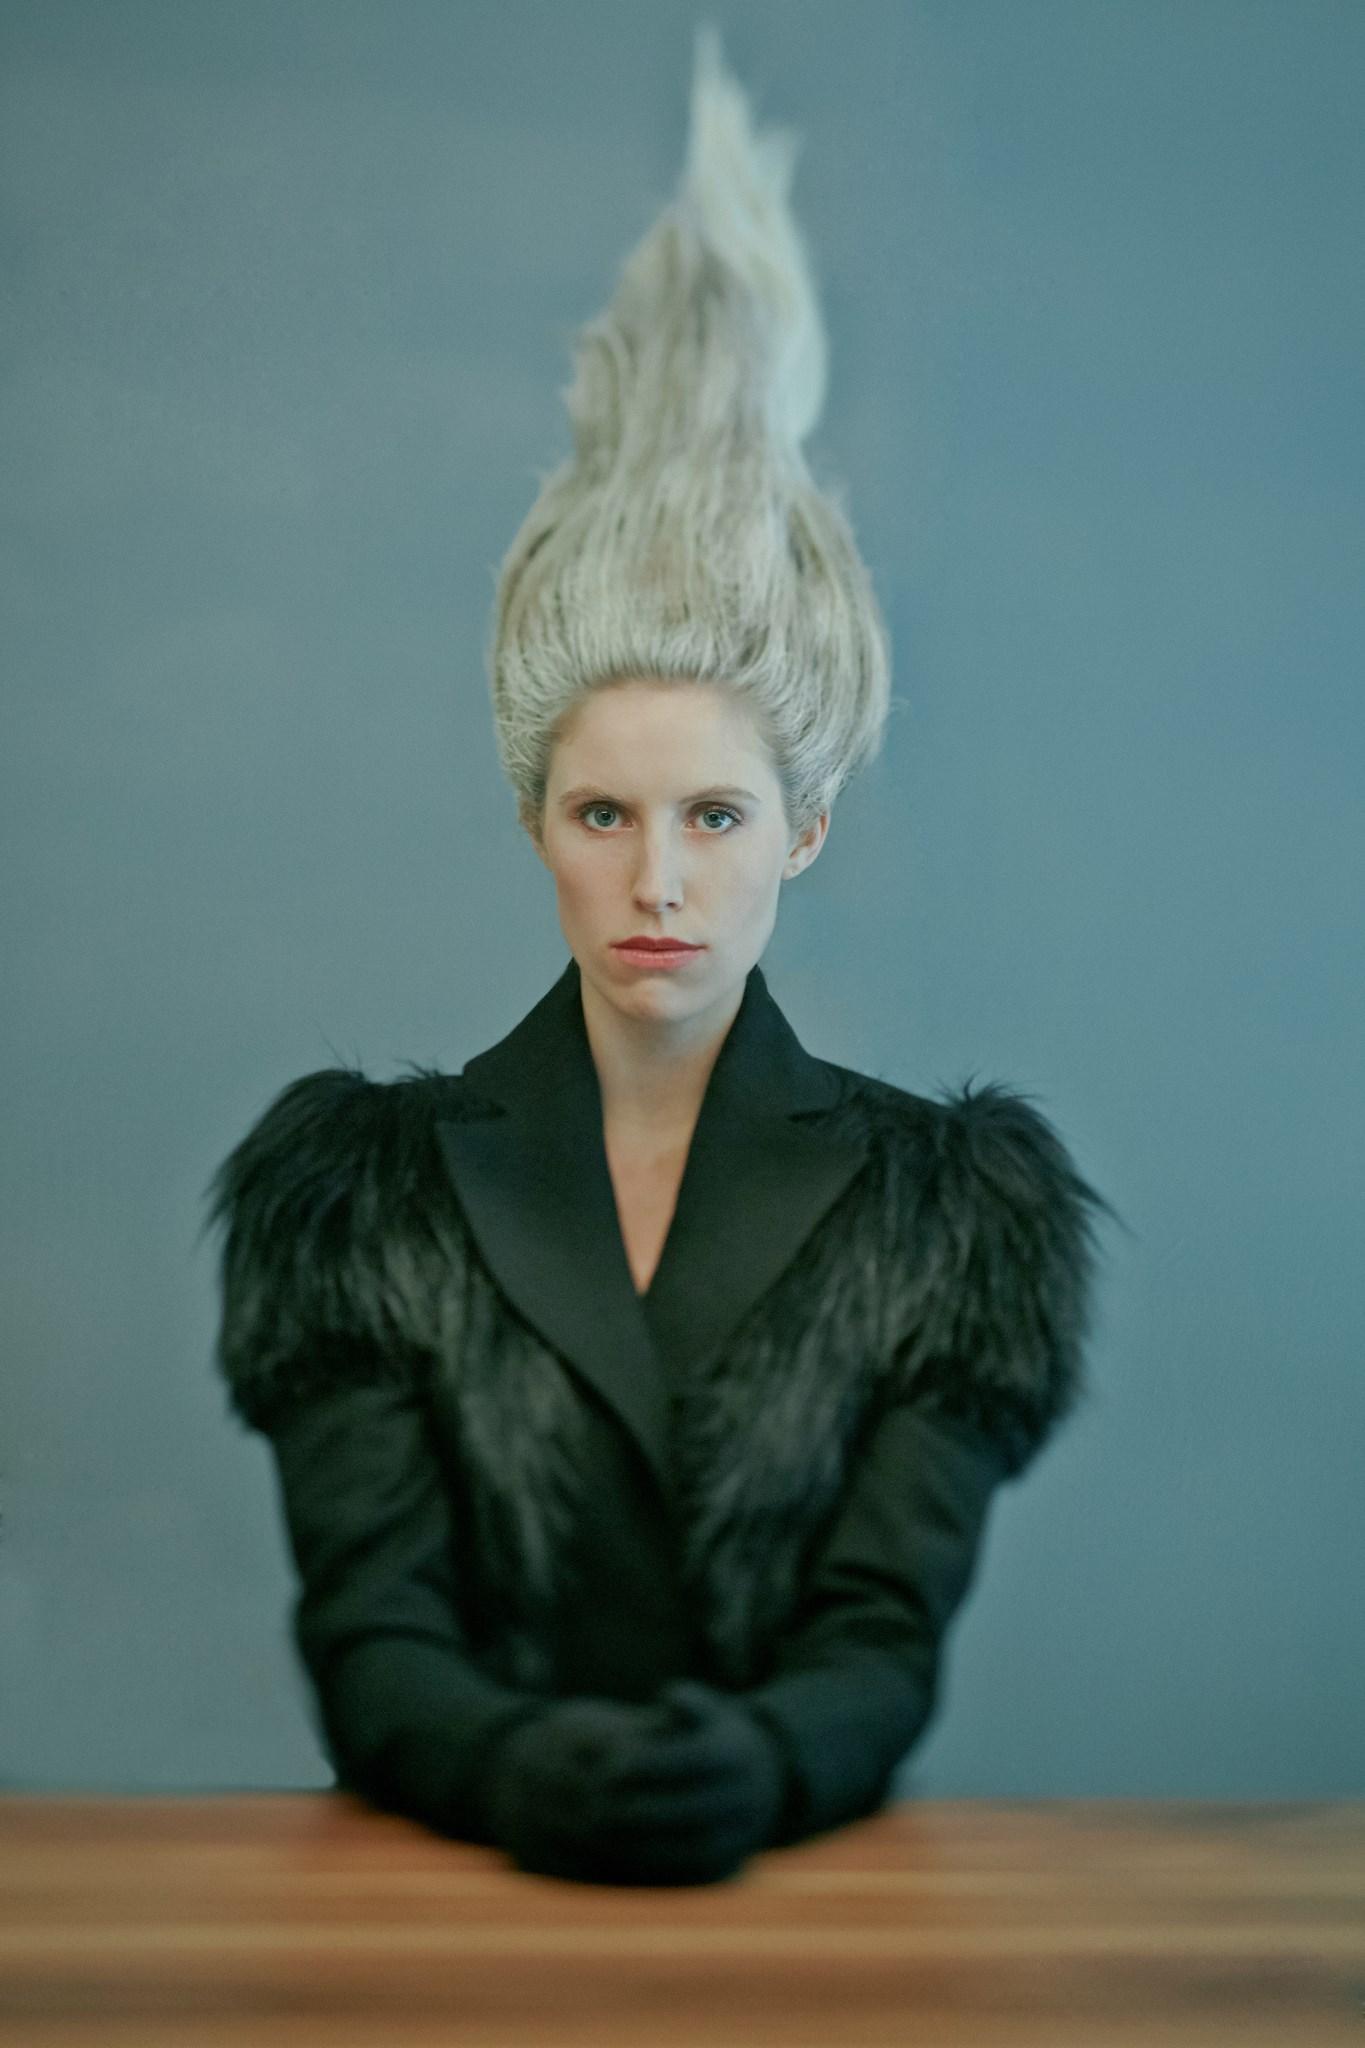 Mark Elzey Jr. - Anna Braun @ Look Model Agency - hair Gabi Baker - makeup Monique Marquez - wardrobe HollyJane Cornell - designer Ken Chen